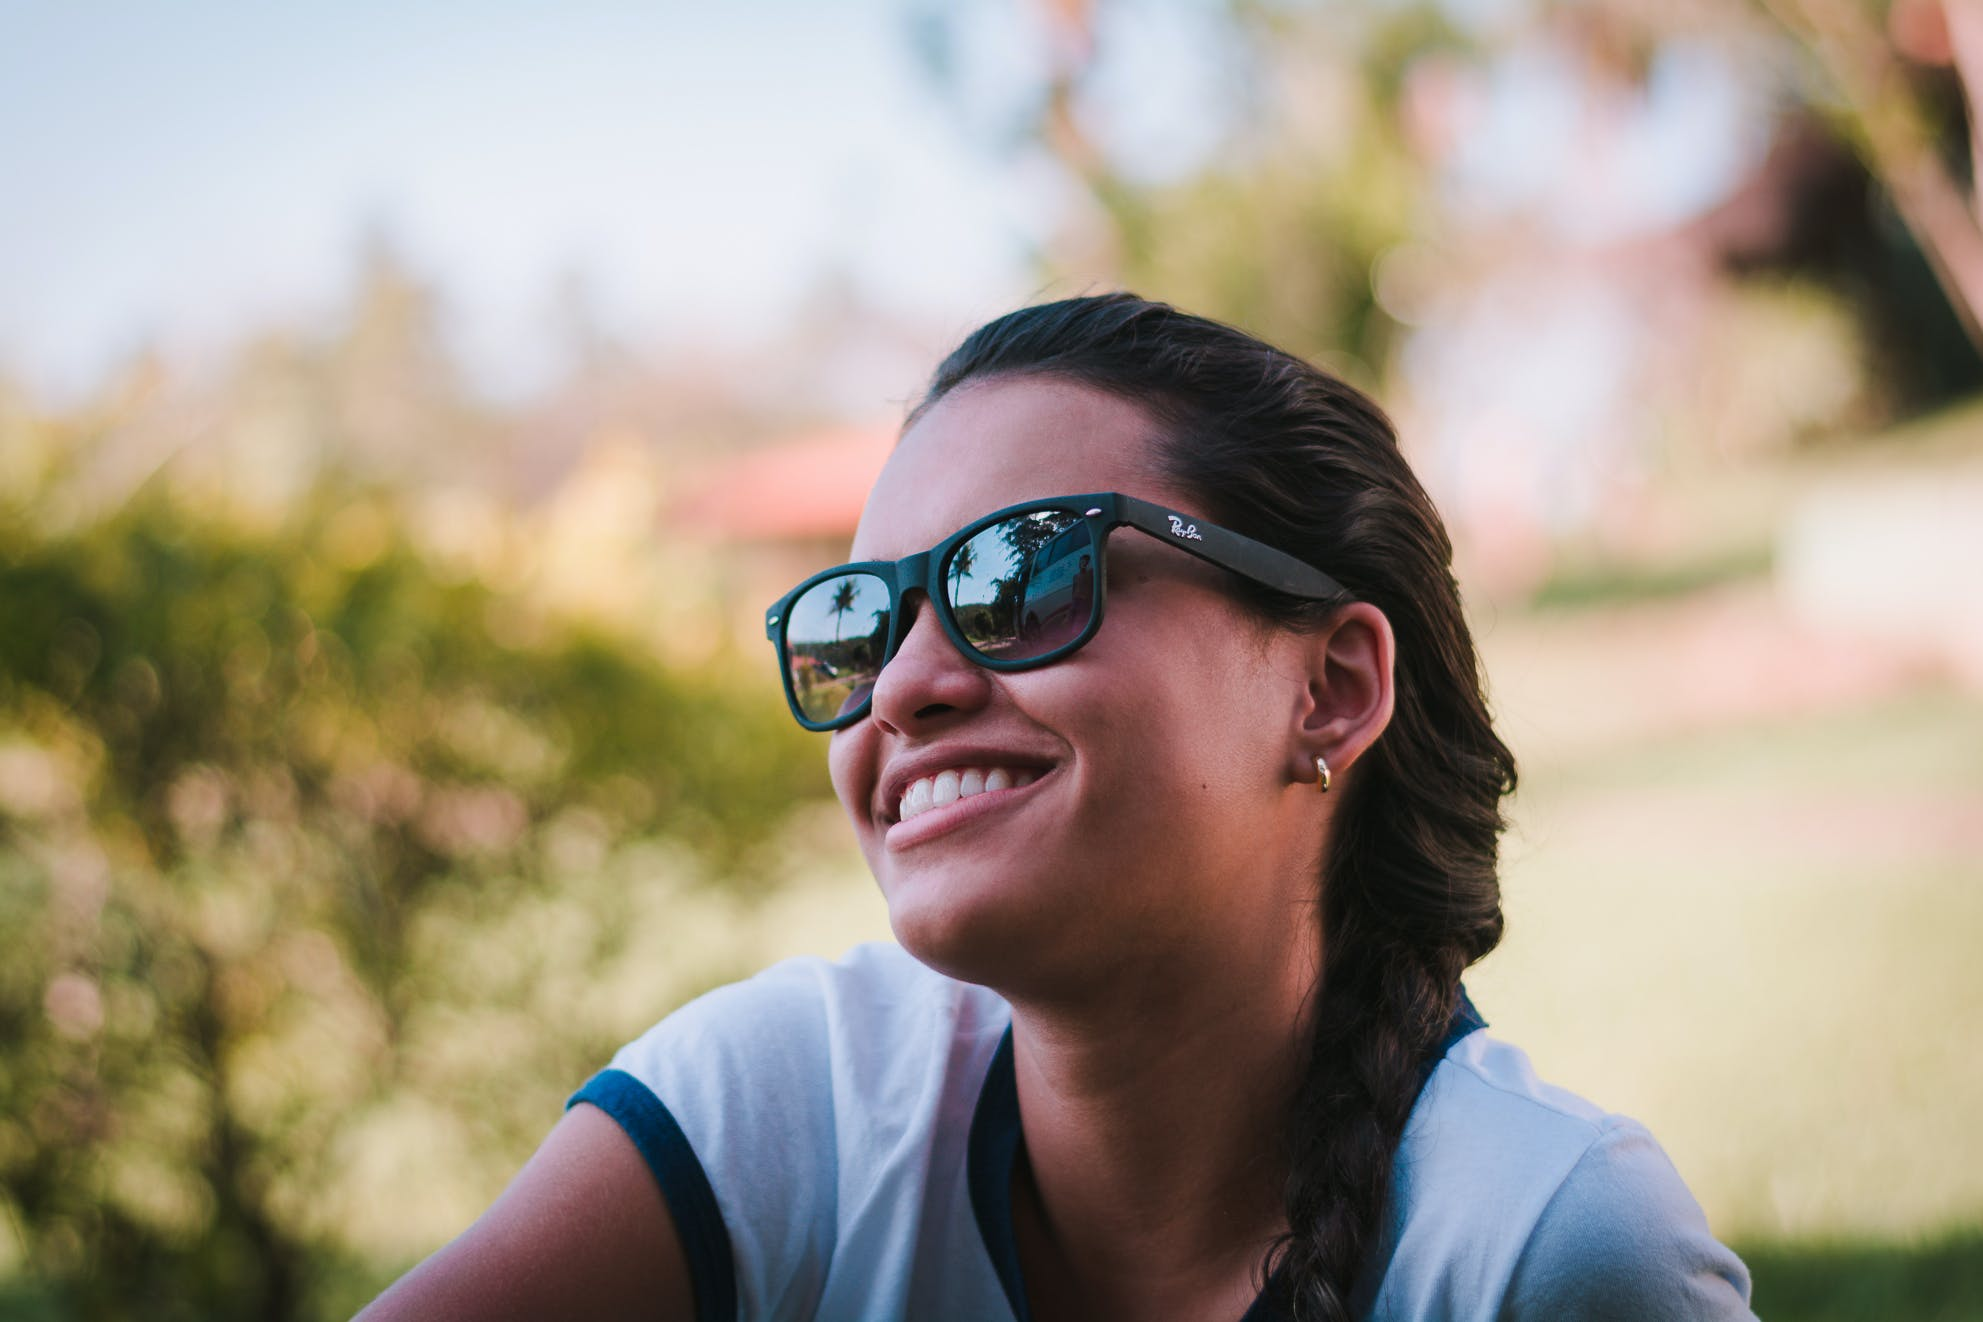 Woman Wearing Black Ray-ban Sunglasses